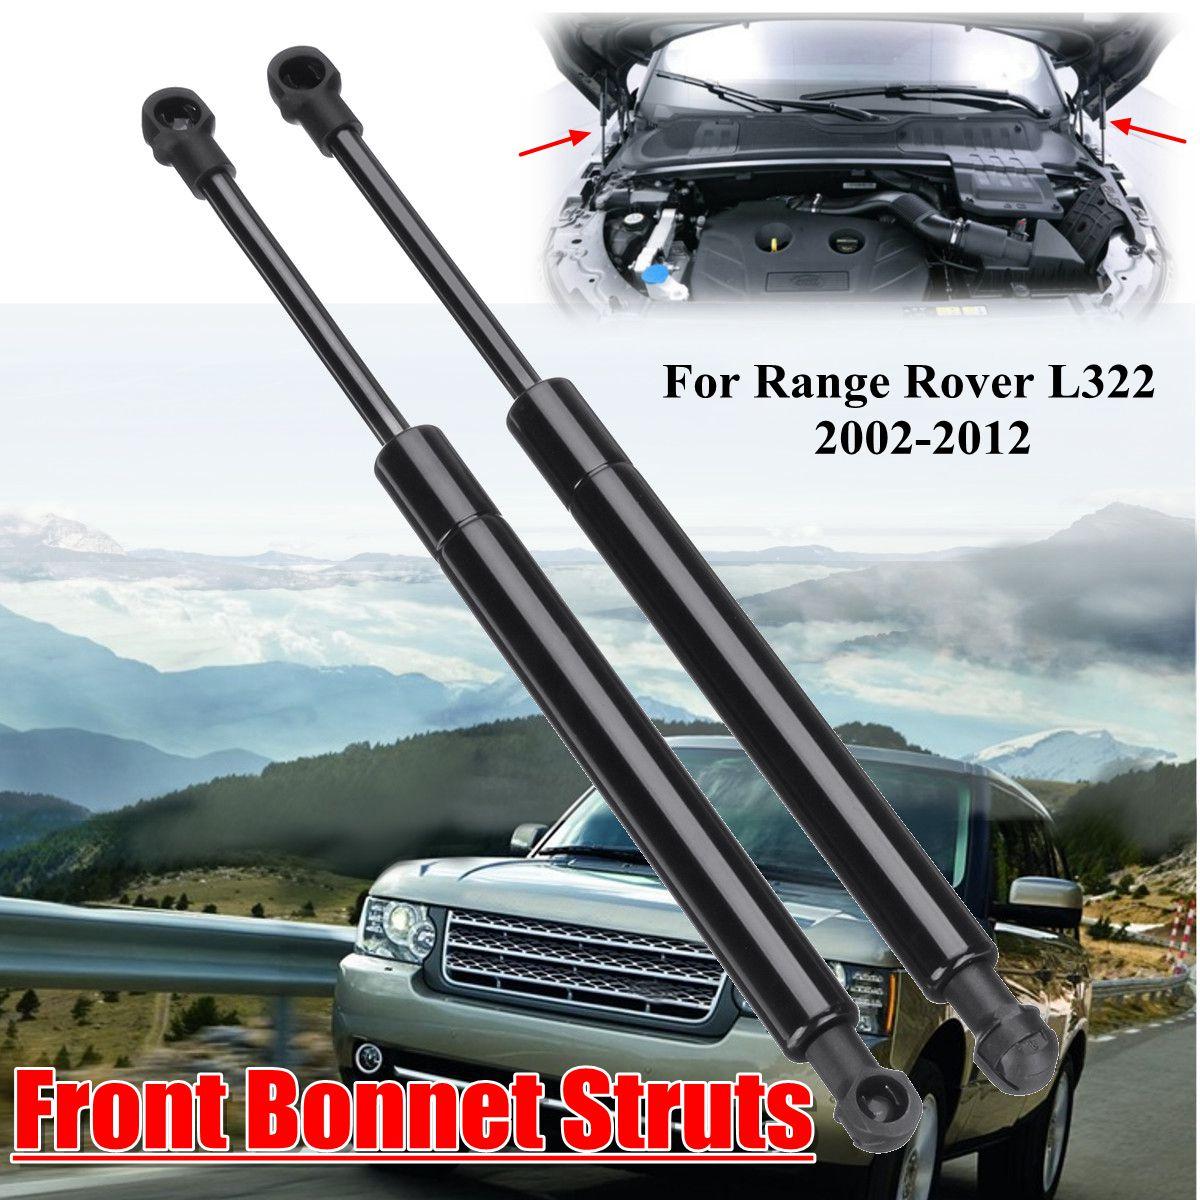 FOR LAND ROVER RANGE ROVER MK3 2002-2012 FRONT BONNET HOOD GAS STRUTS SUPPORT